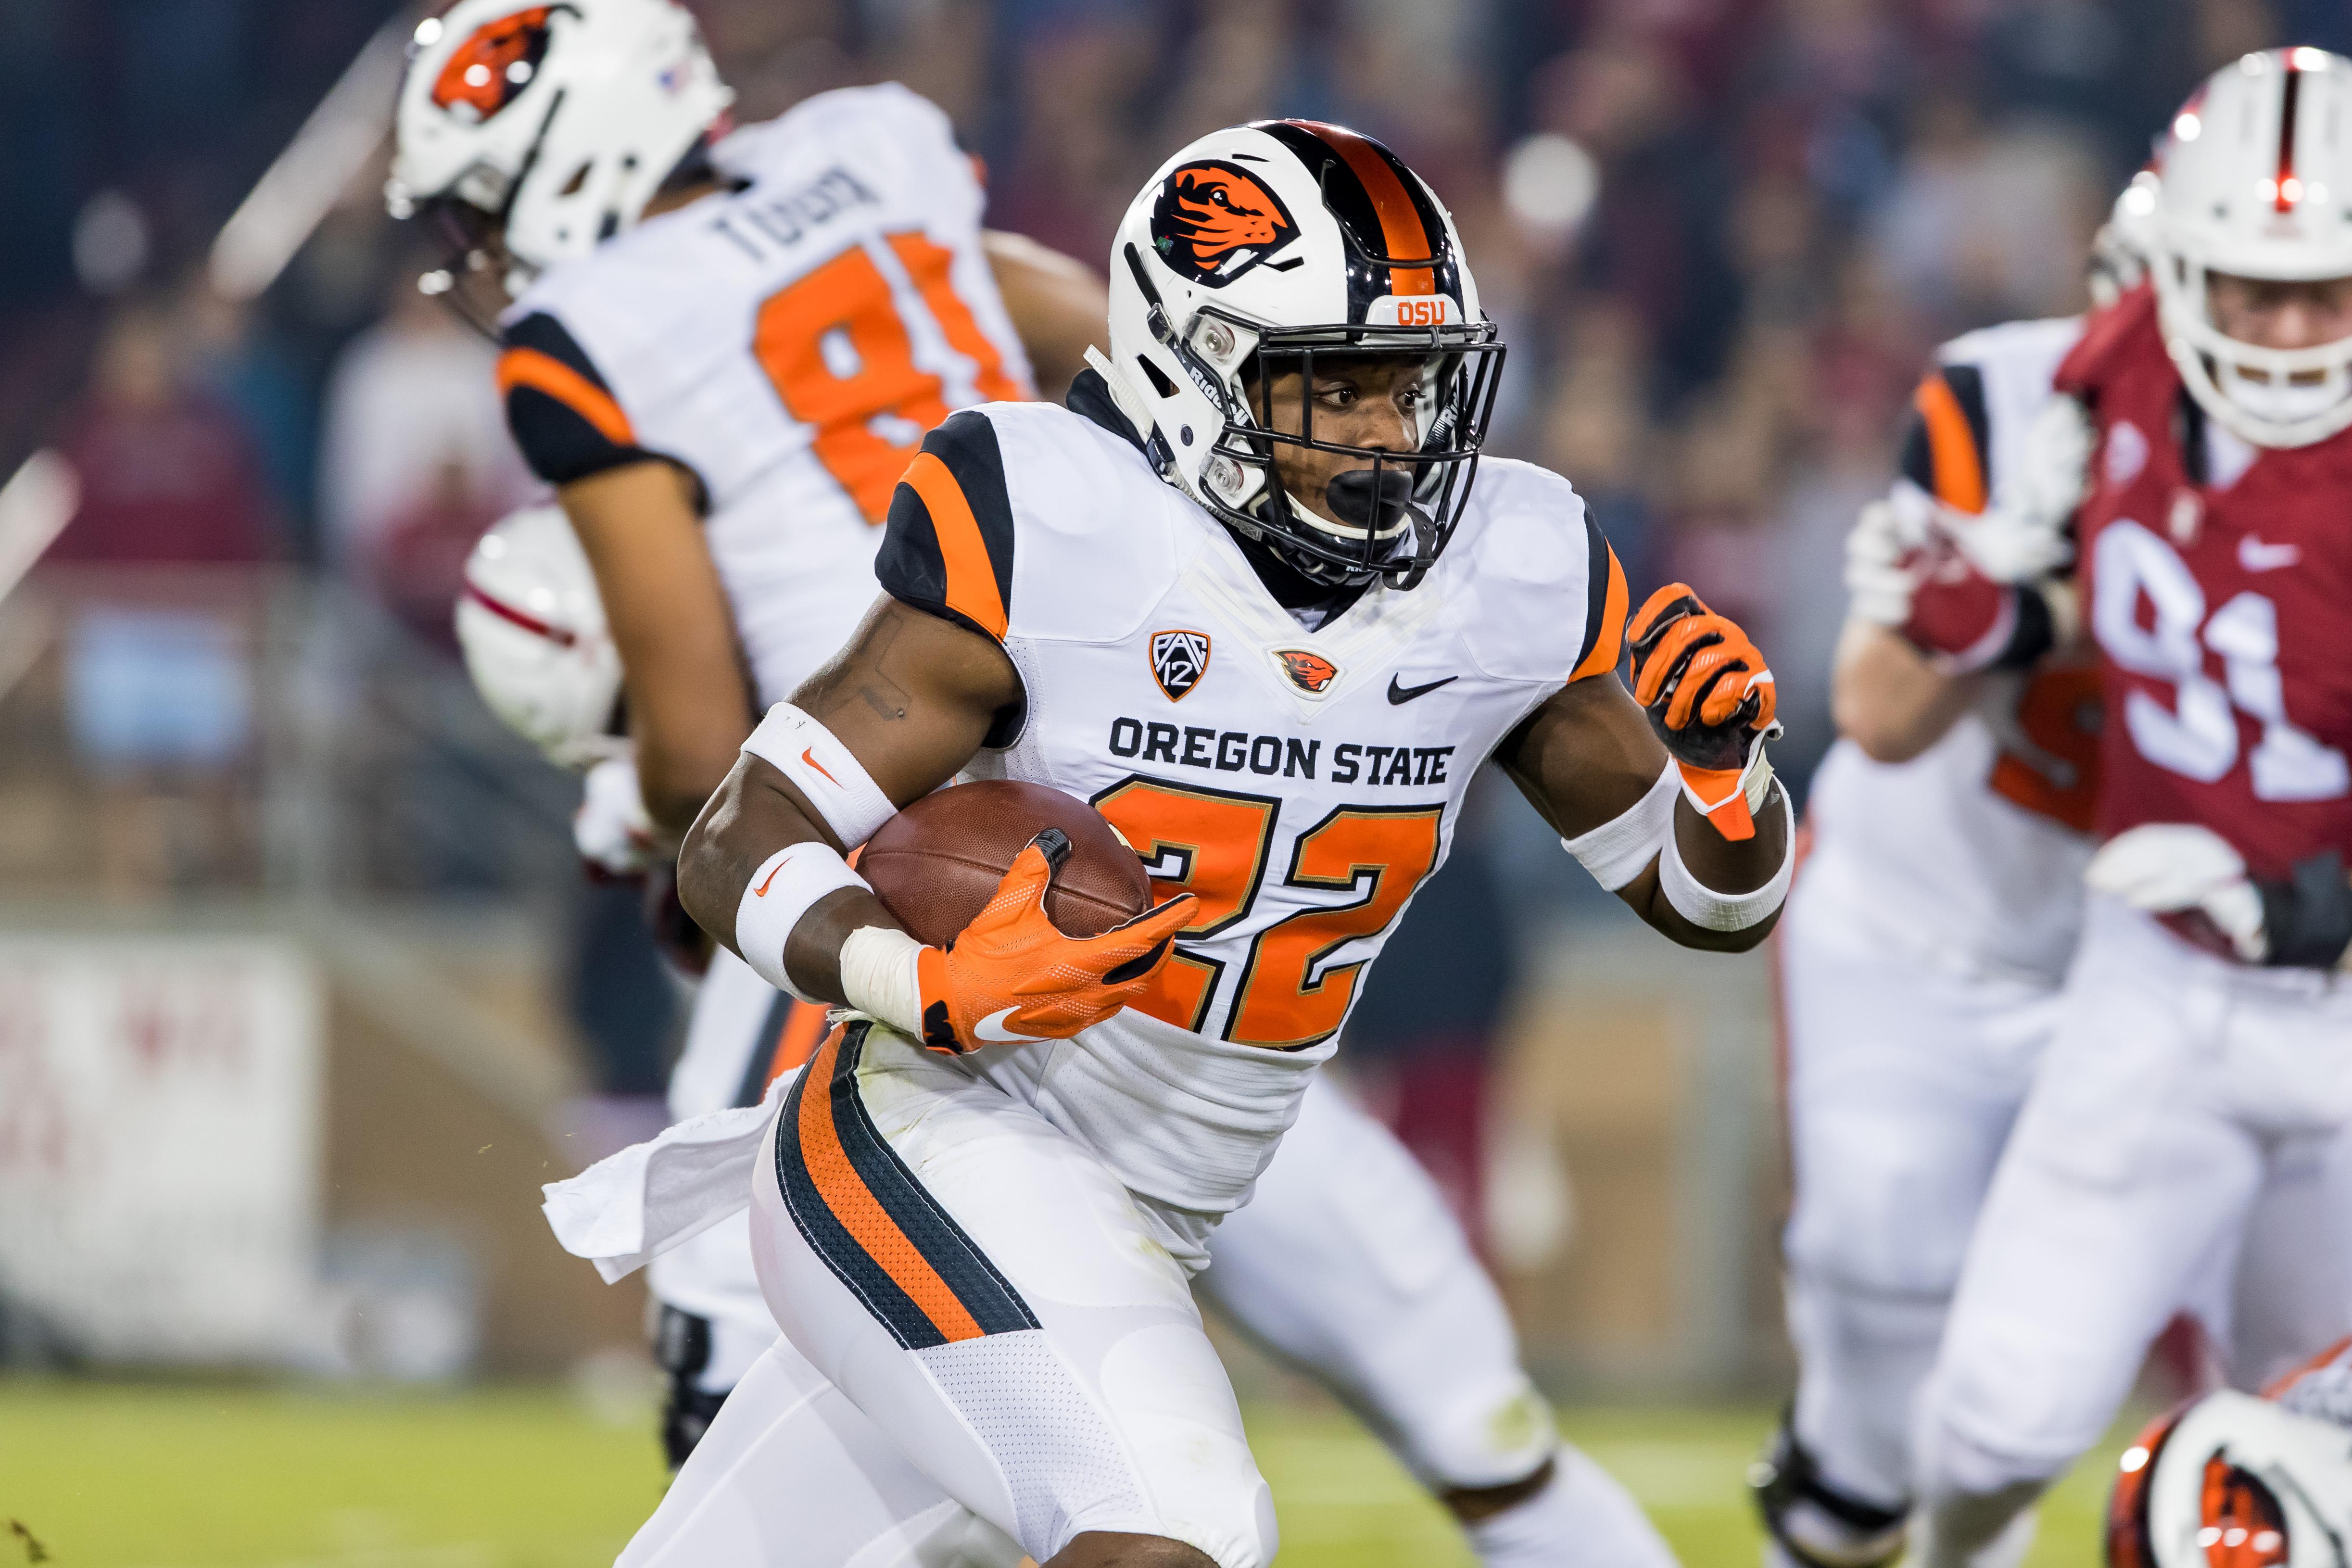 COLLEGE FOOTBALL: NOV 10 Oregon State at Stanford